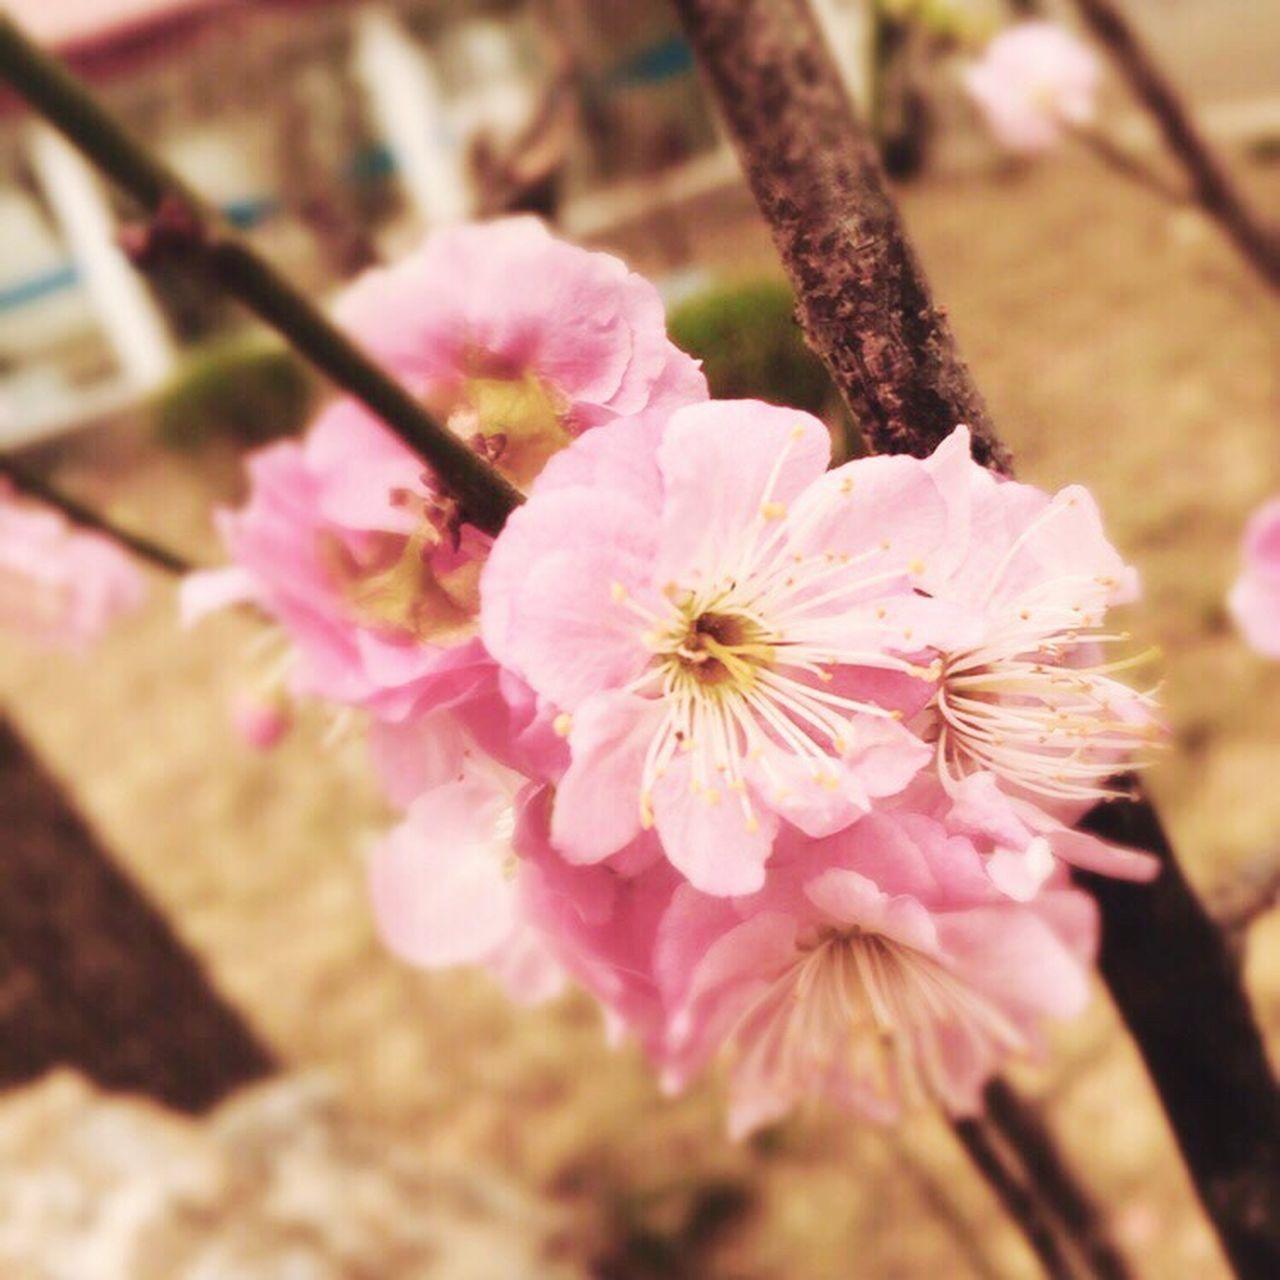 Le printemps à Pékin🍃 Hello World Relaxing Taking Photos Enjoying Life